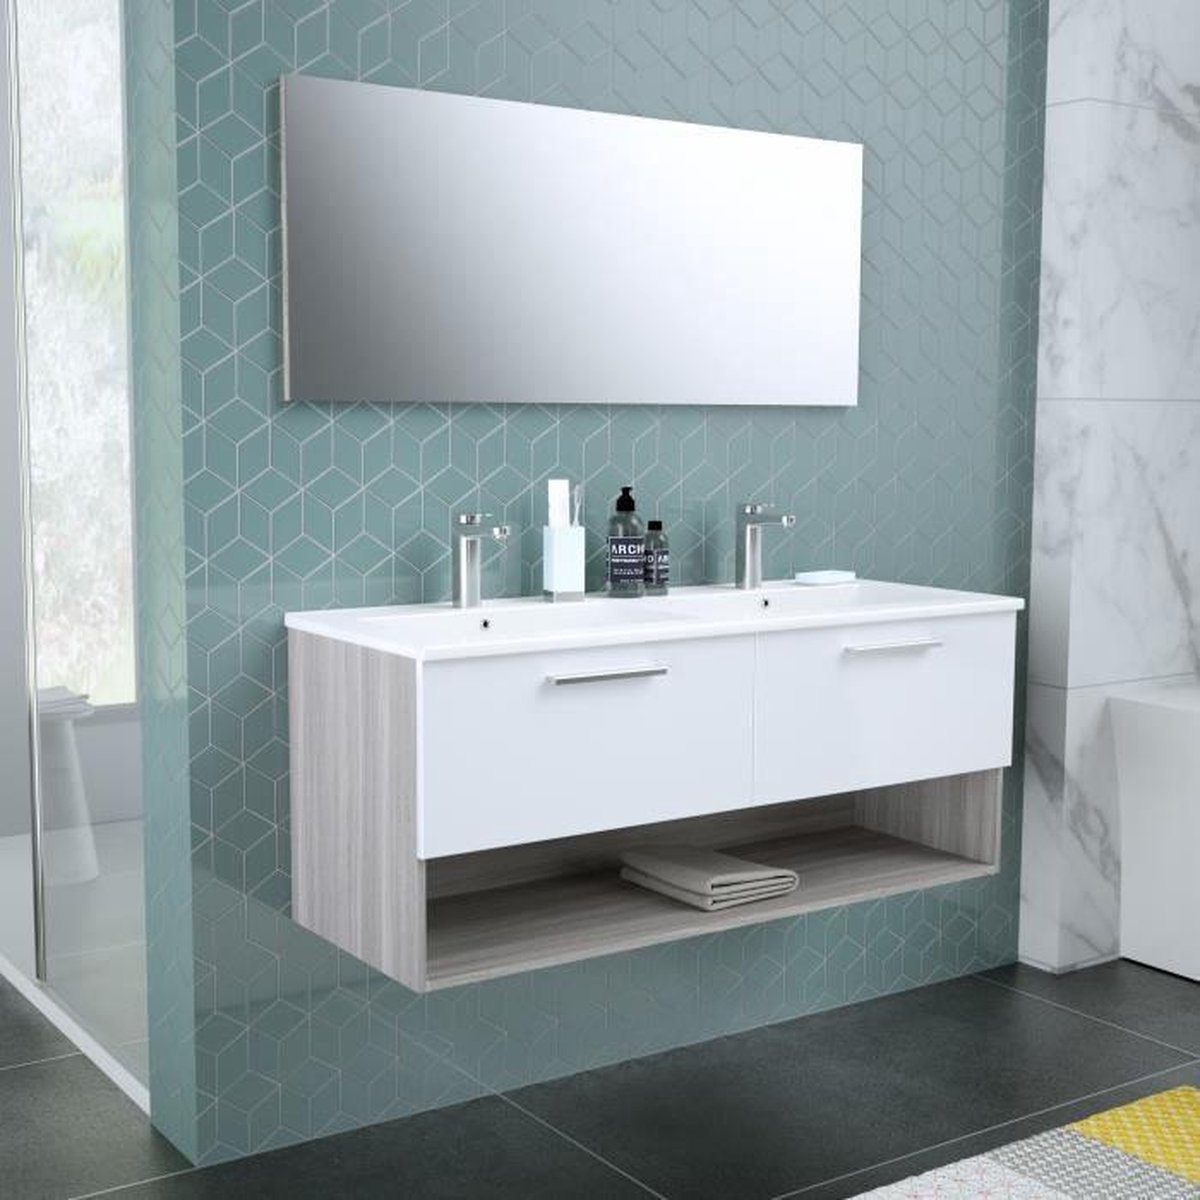 BENTO Dubbele wastafel badkamer + spiegel L 120 cm - 2 langzaam sluitende lades - Wit